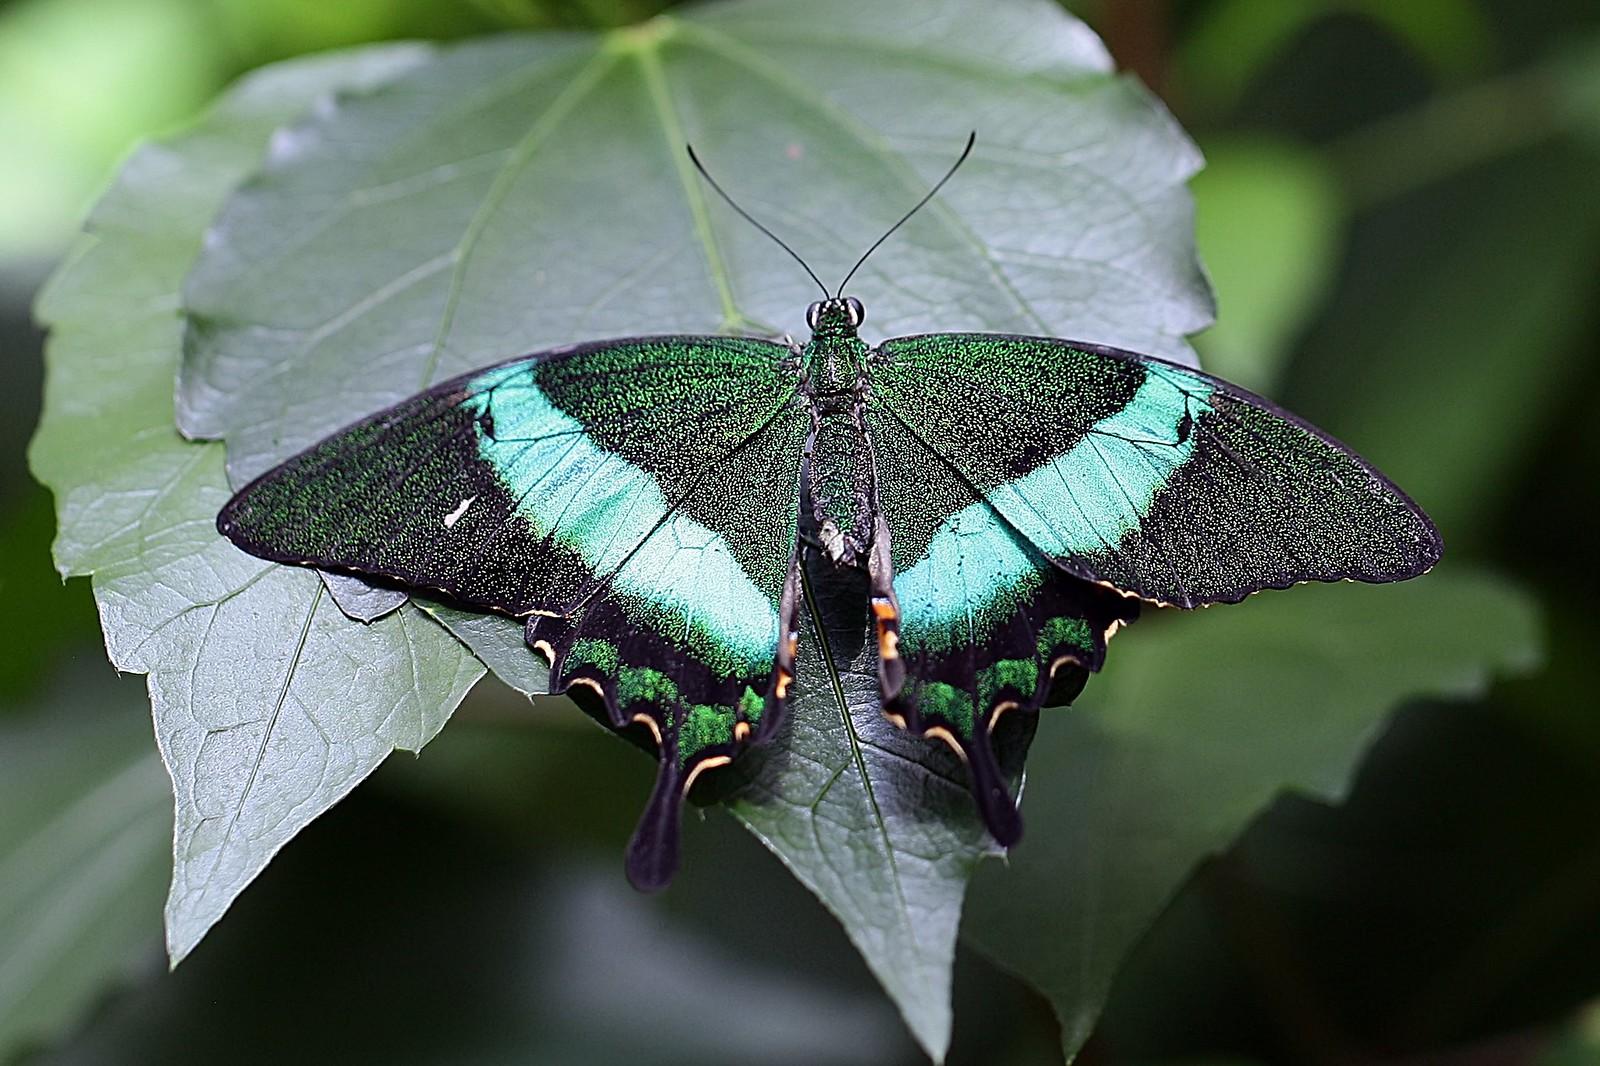 Emerald swallowtail, Canon EOS 5D MARK II, Canon EF 100mm f/2.8L Macro IS USM